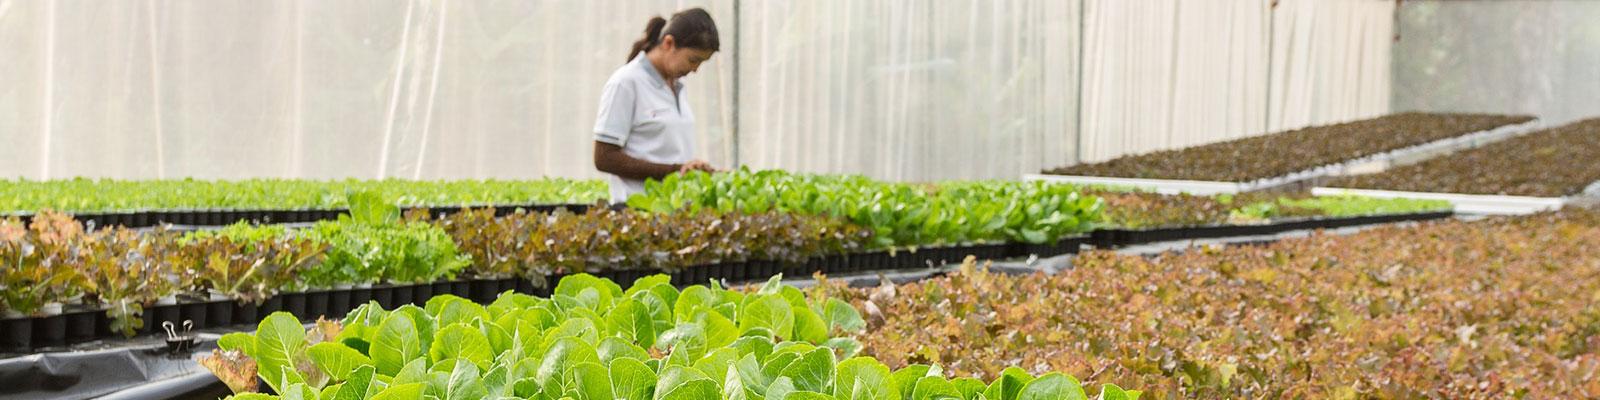 organic farming,เกษตรอินทรีย์,เกษตรปลอดสาร